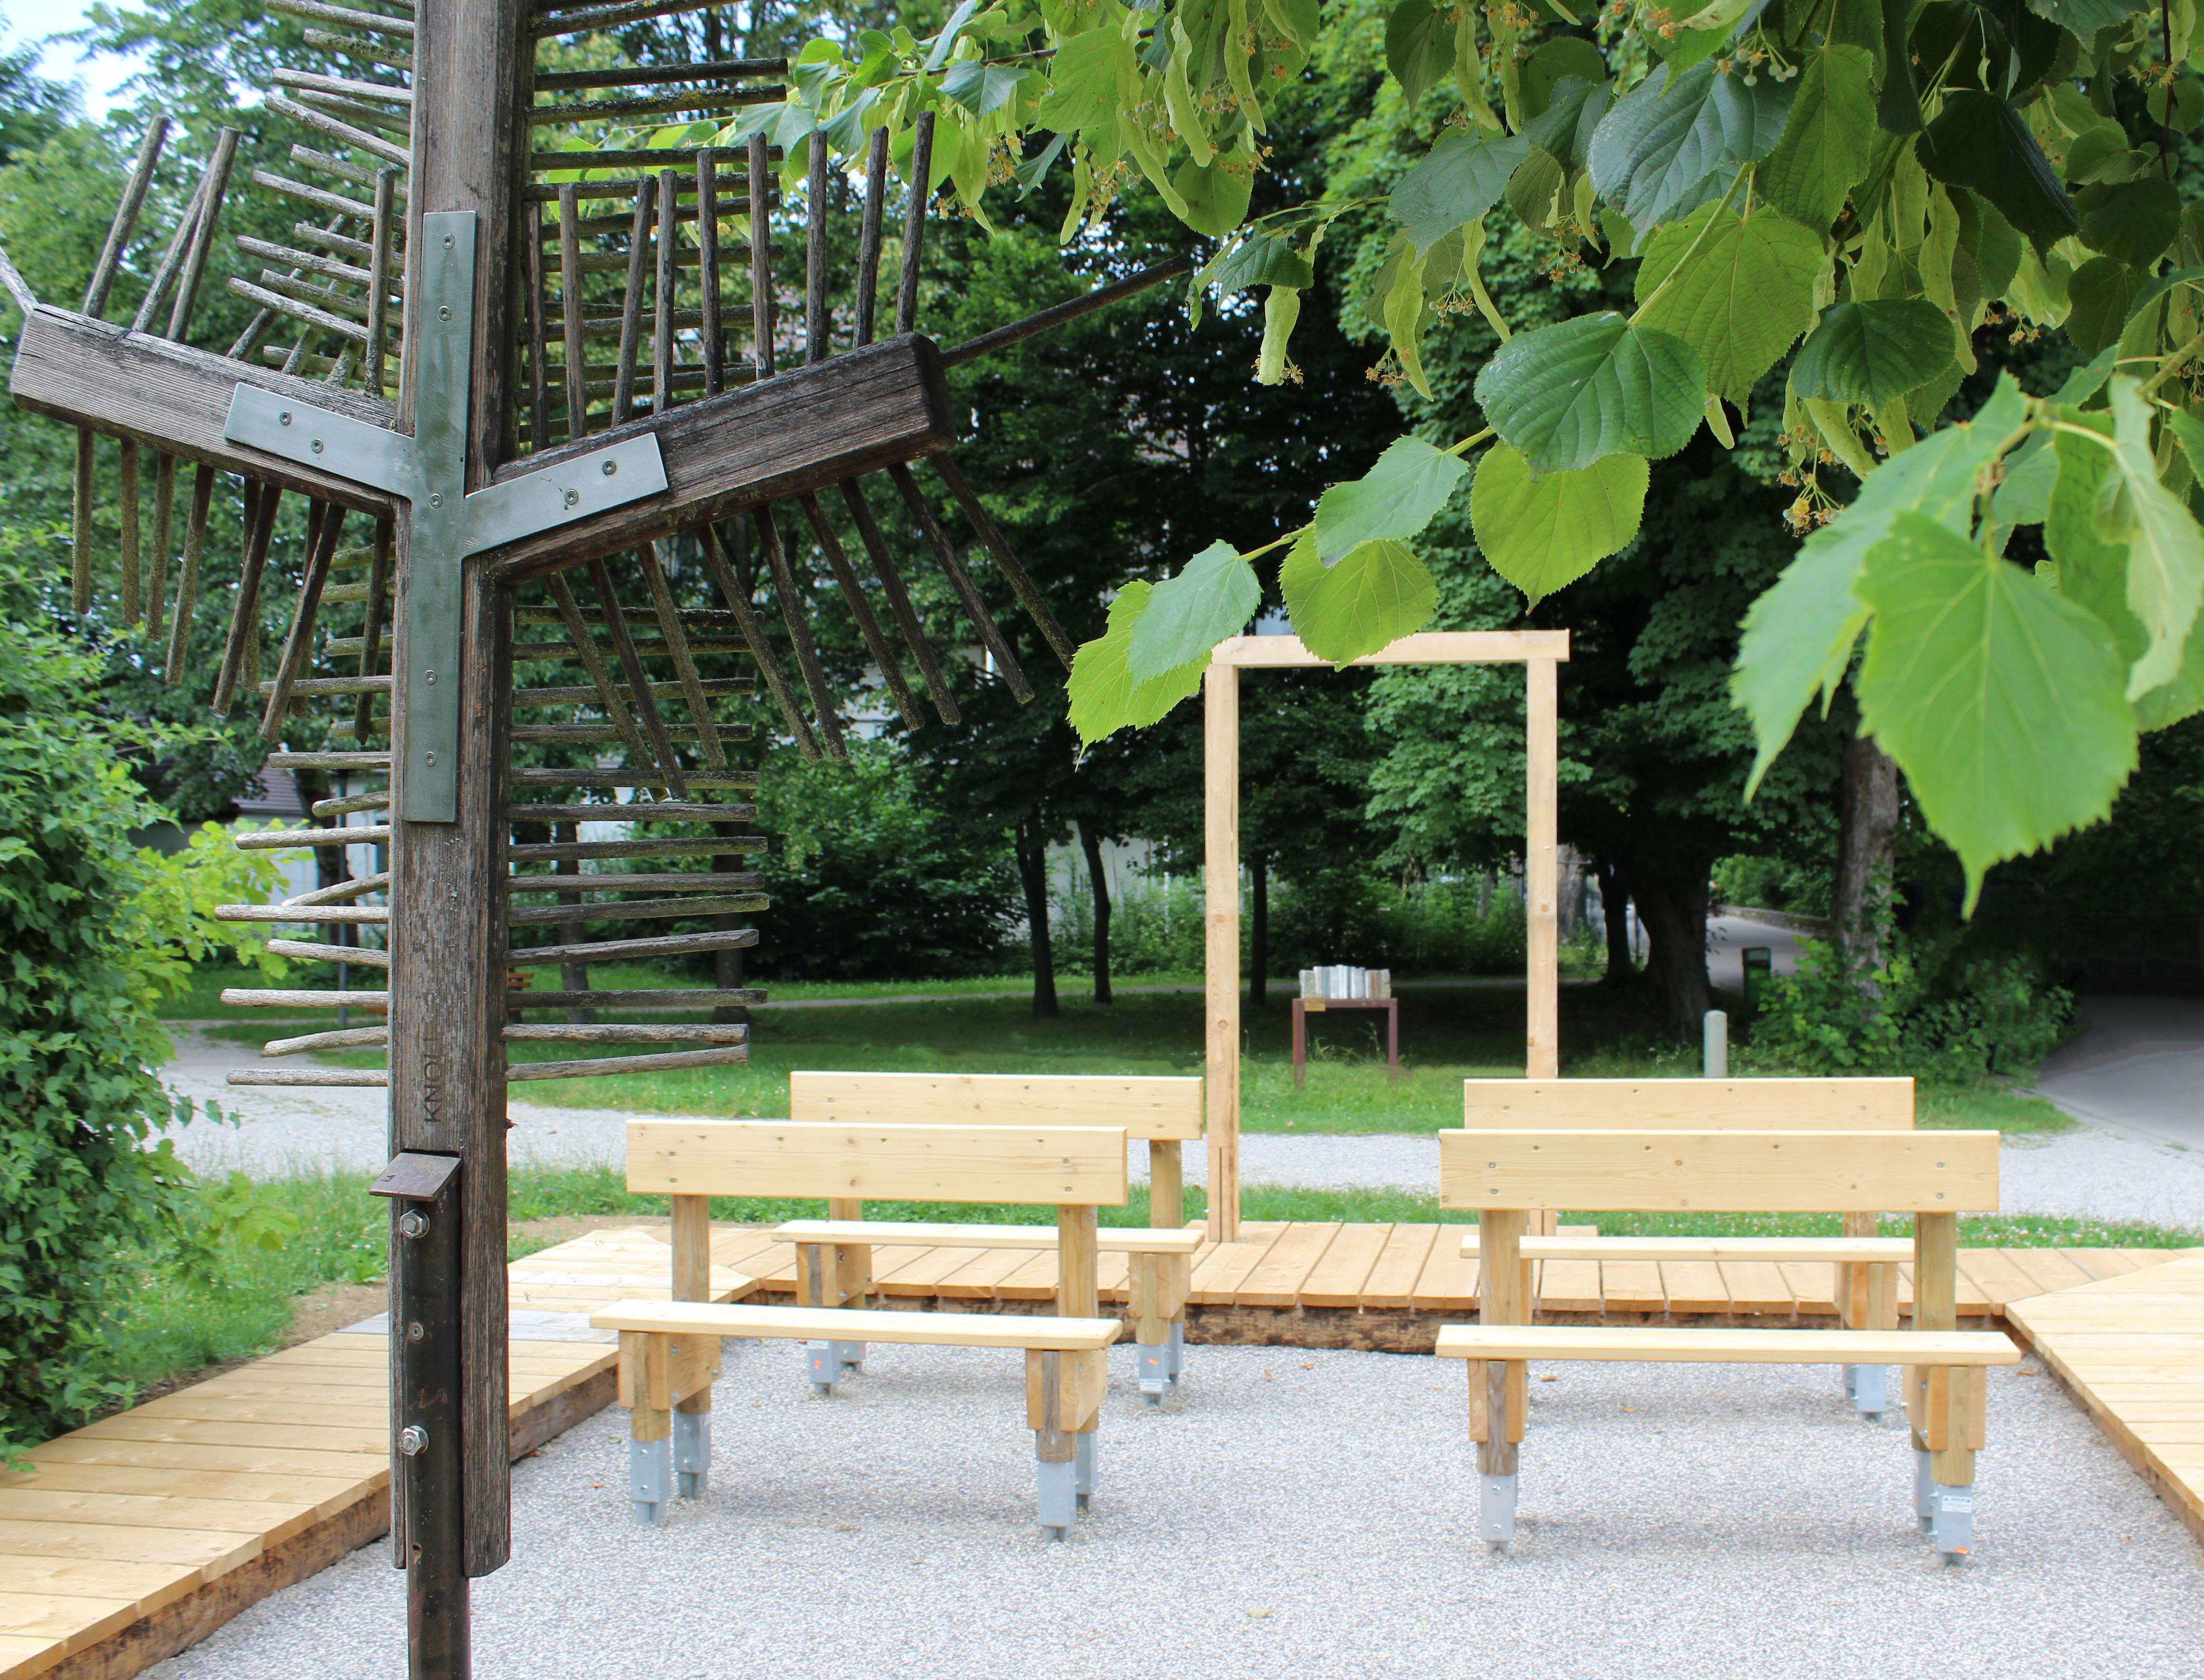 Waldkapelle im Stadtgarten